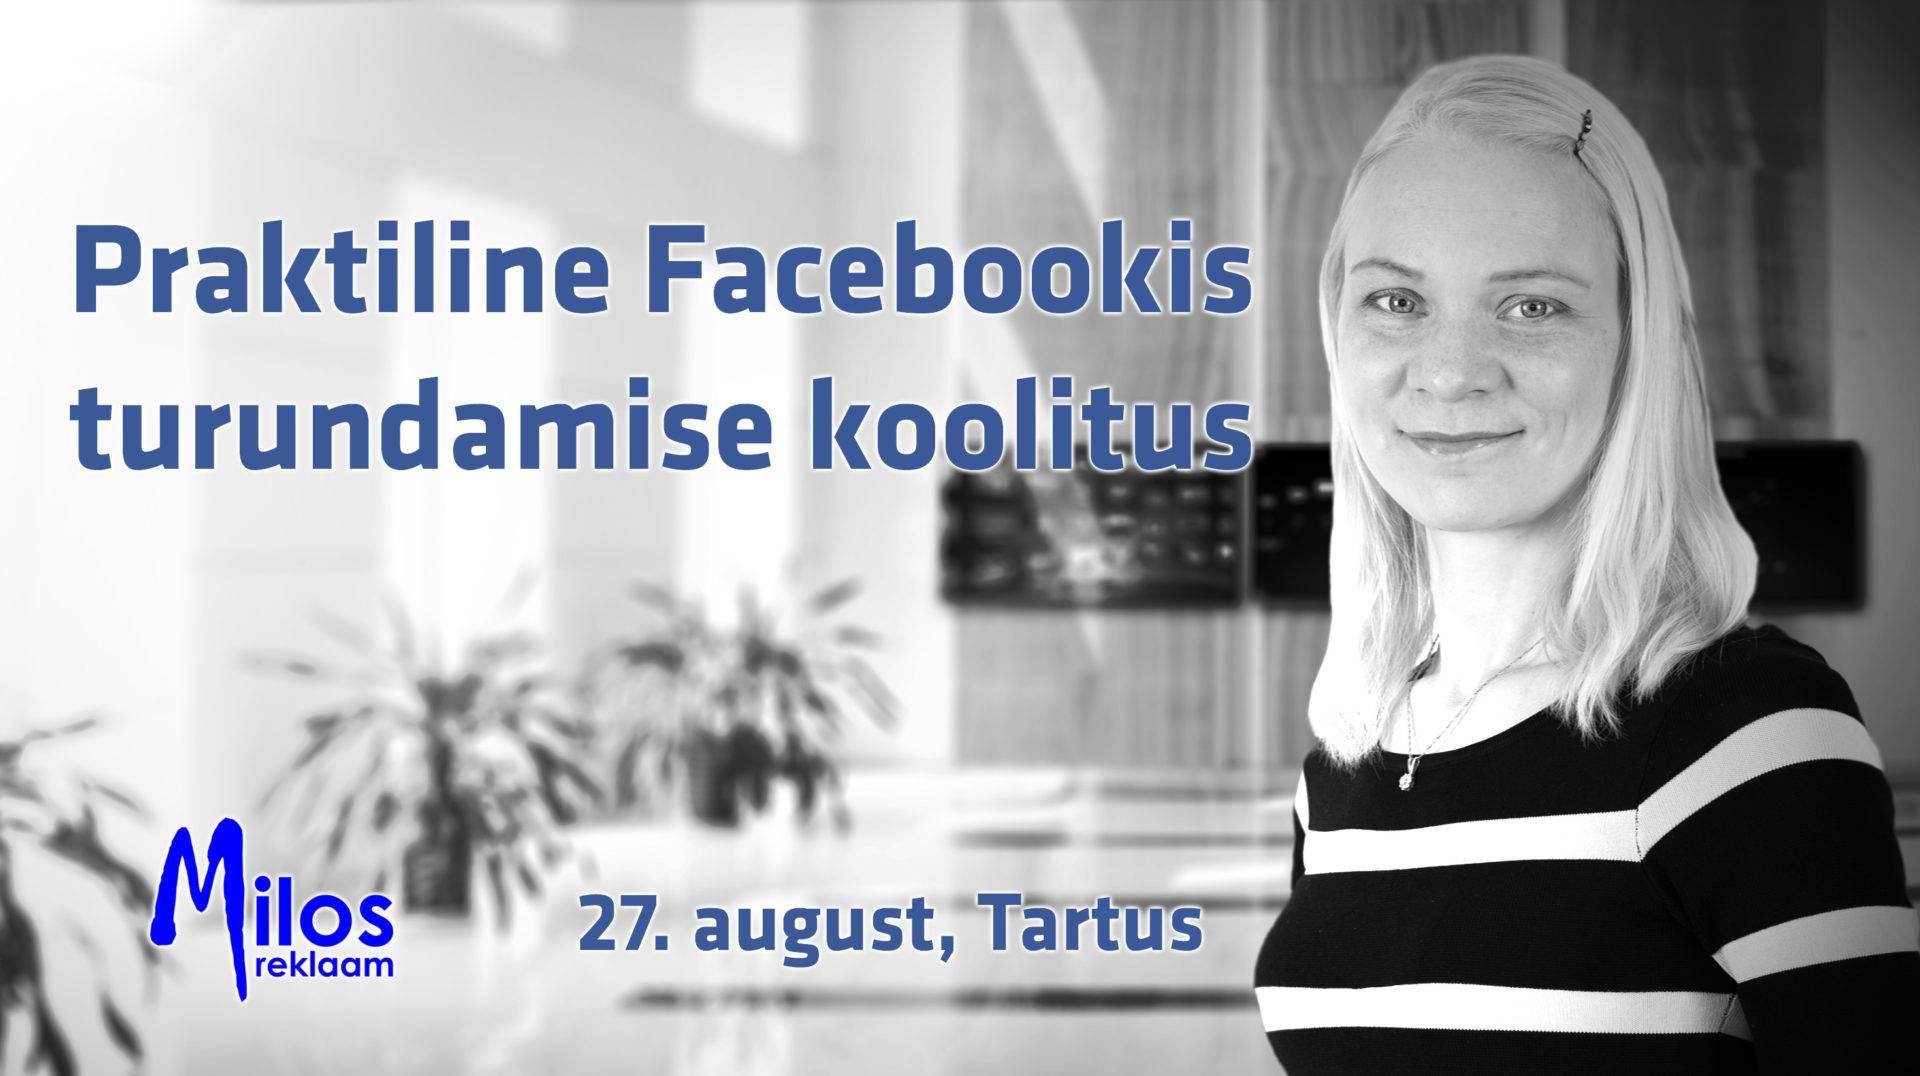 Praktiline Facebookis turundamise koolitus Tartus